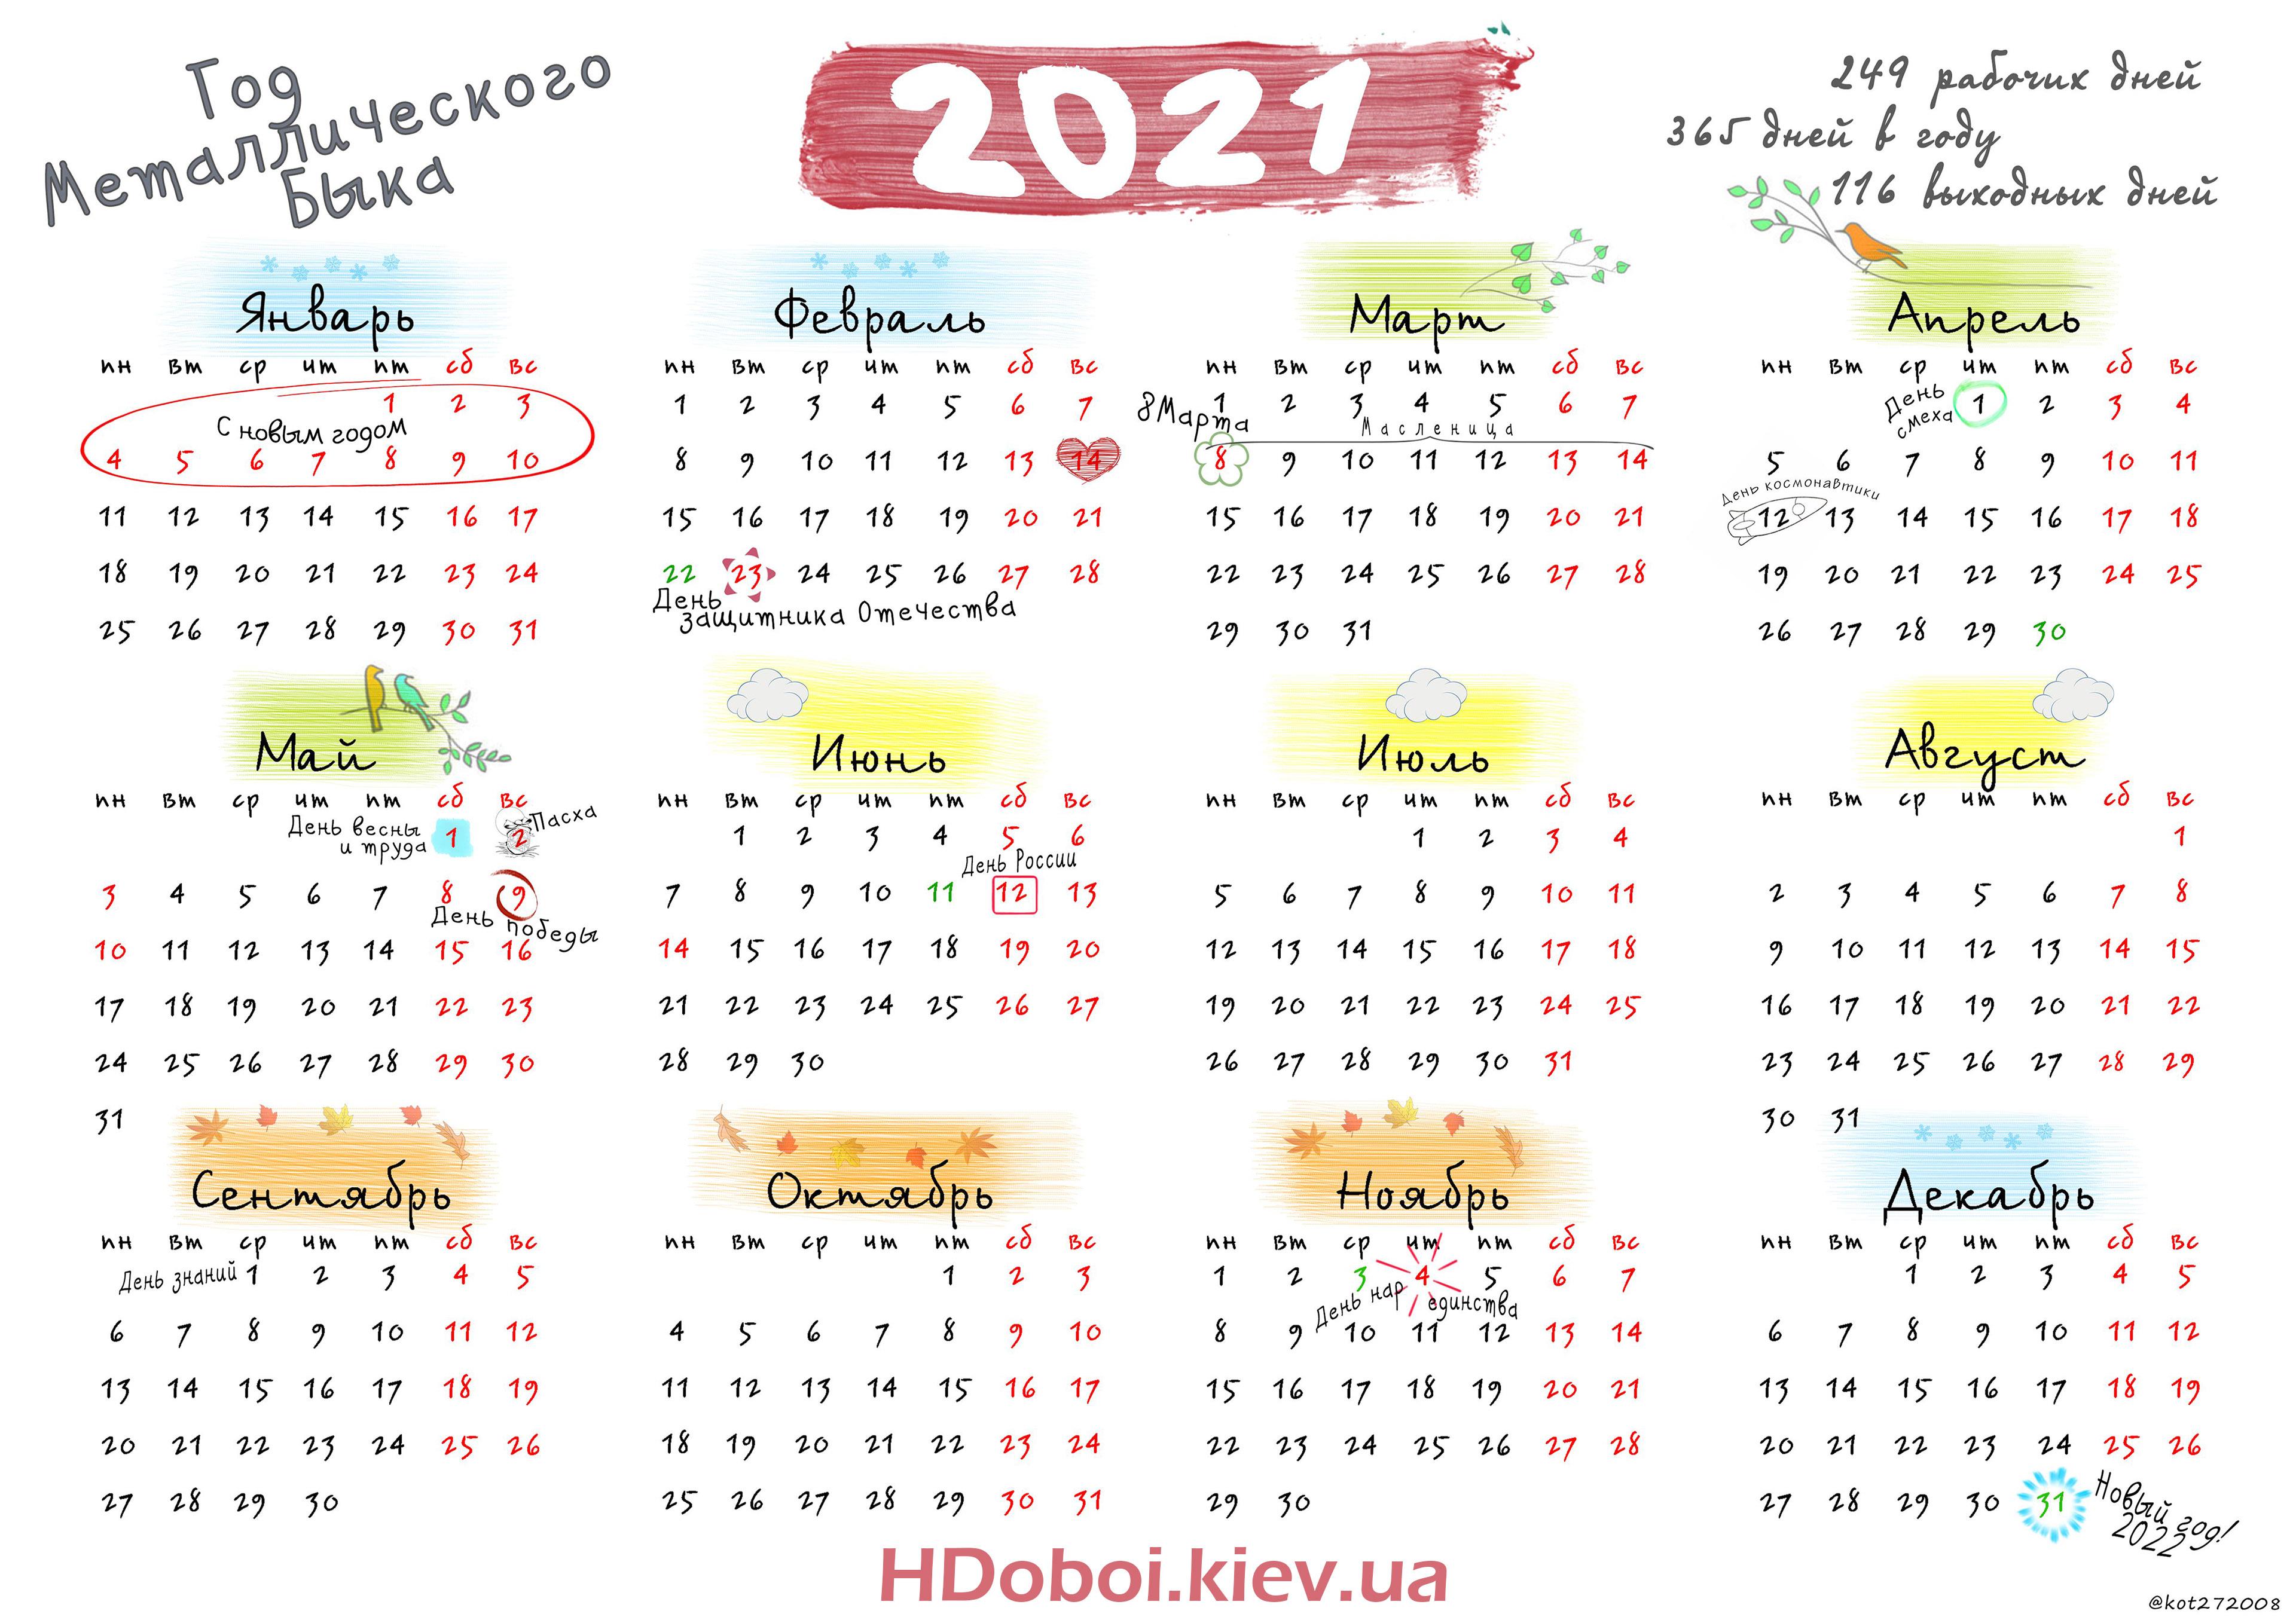 HDoboi.Kiev.ua - Календарь 2021 года с праздниками